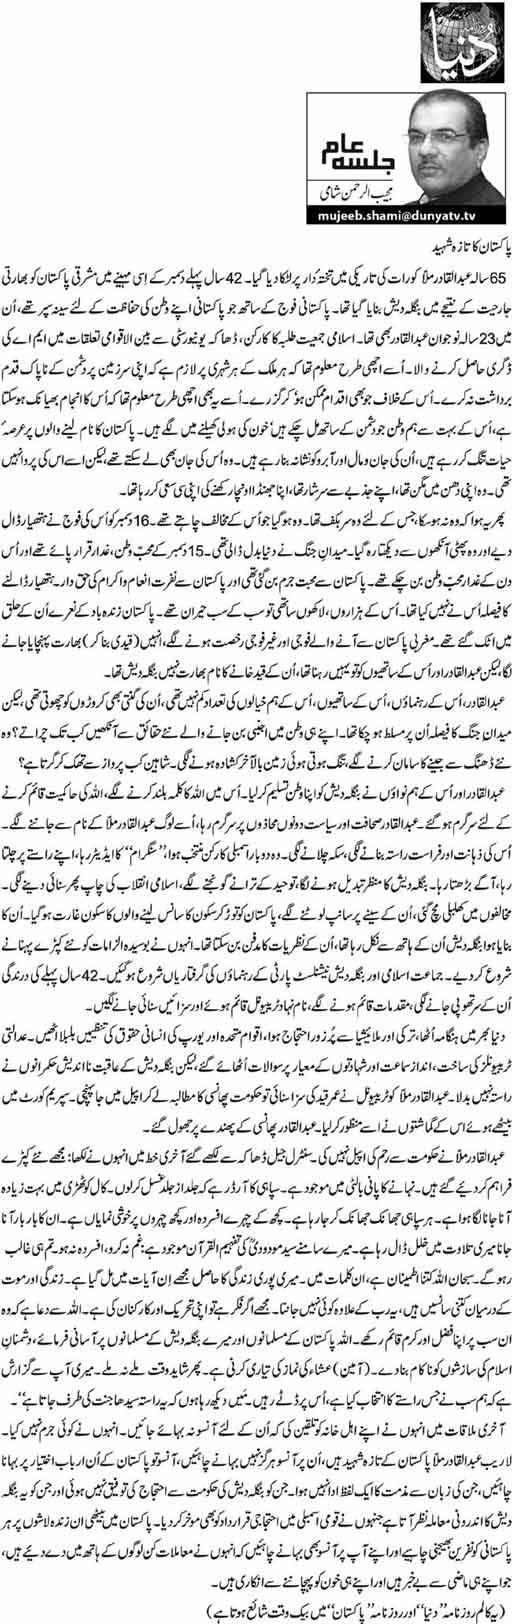 Pakistan Ka Taza Shaheed - Mujeeb ur Rehman Shami - 15th December 2013